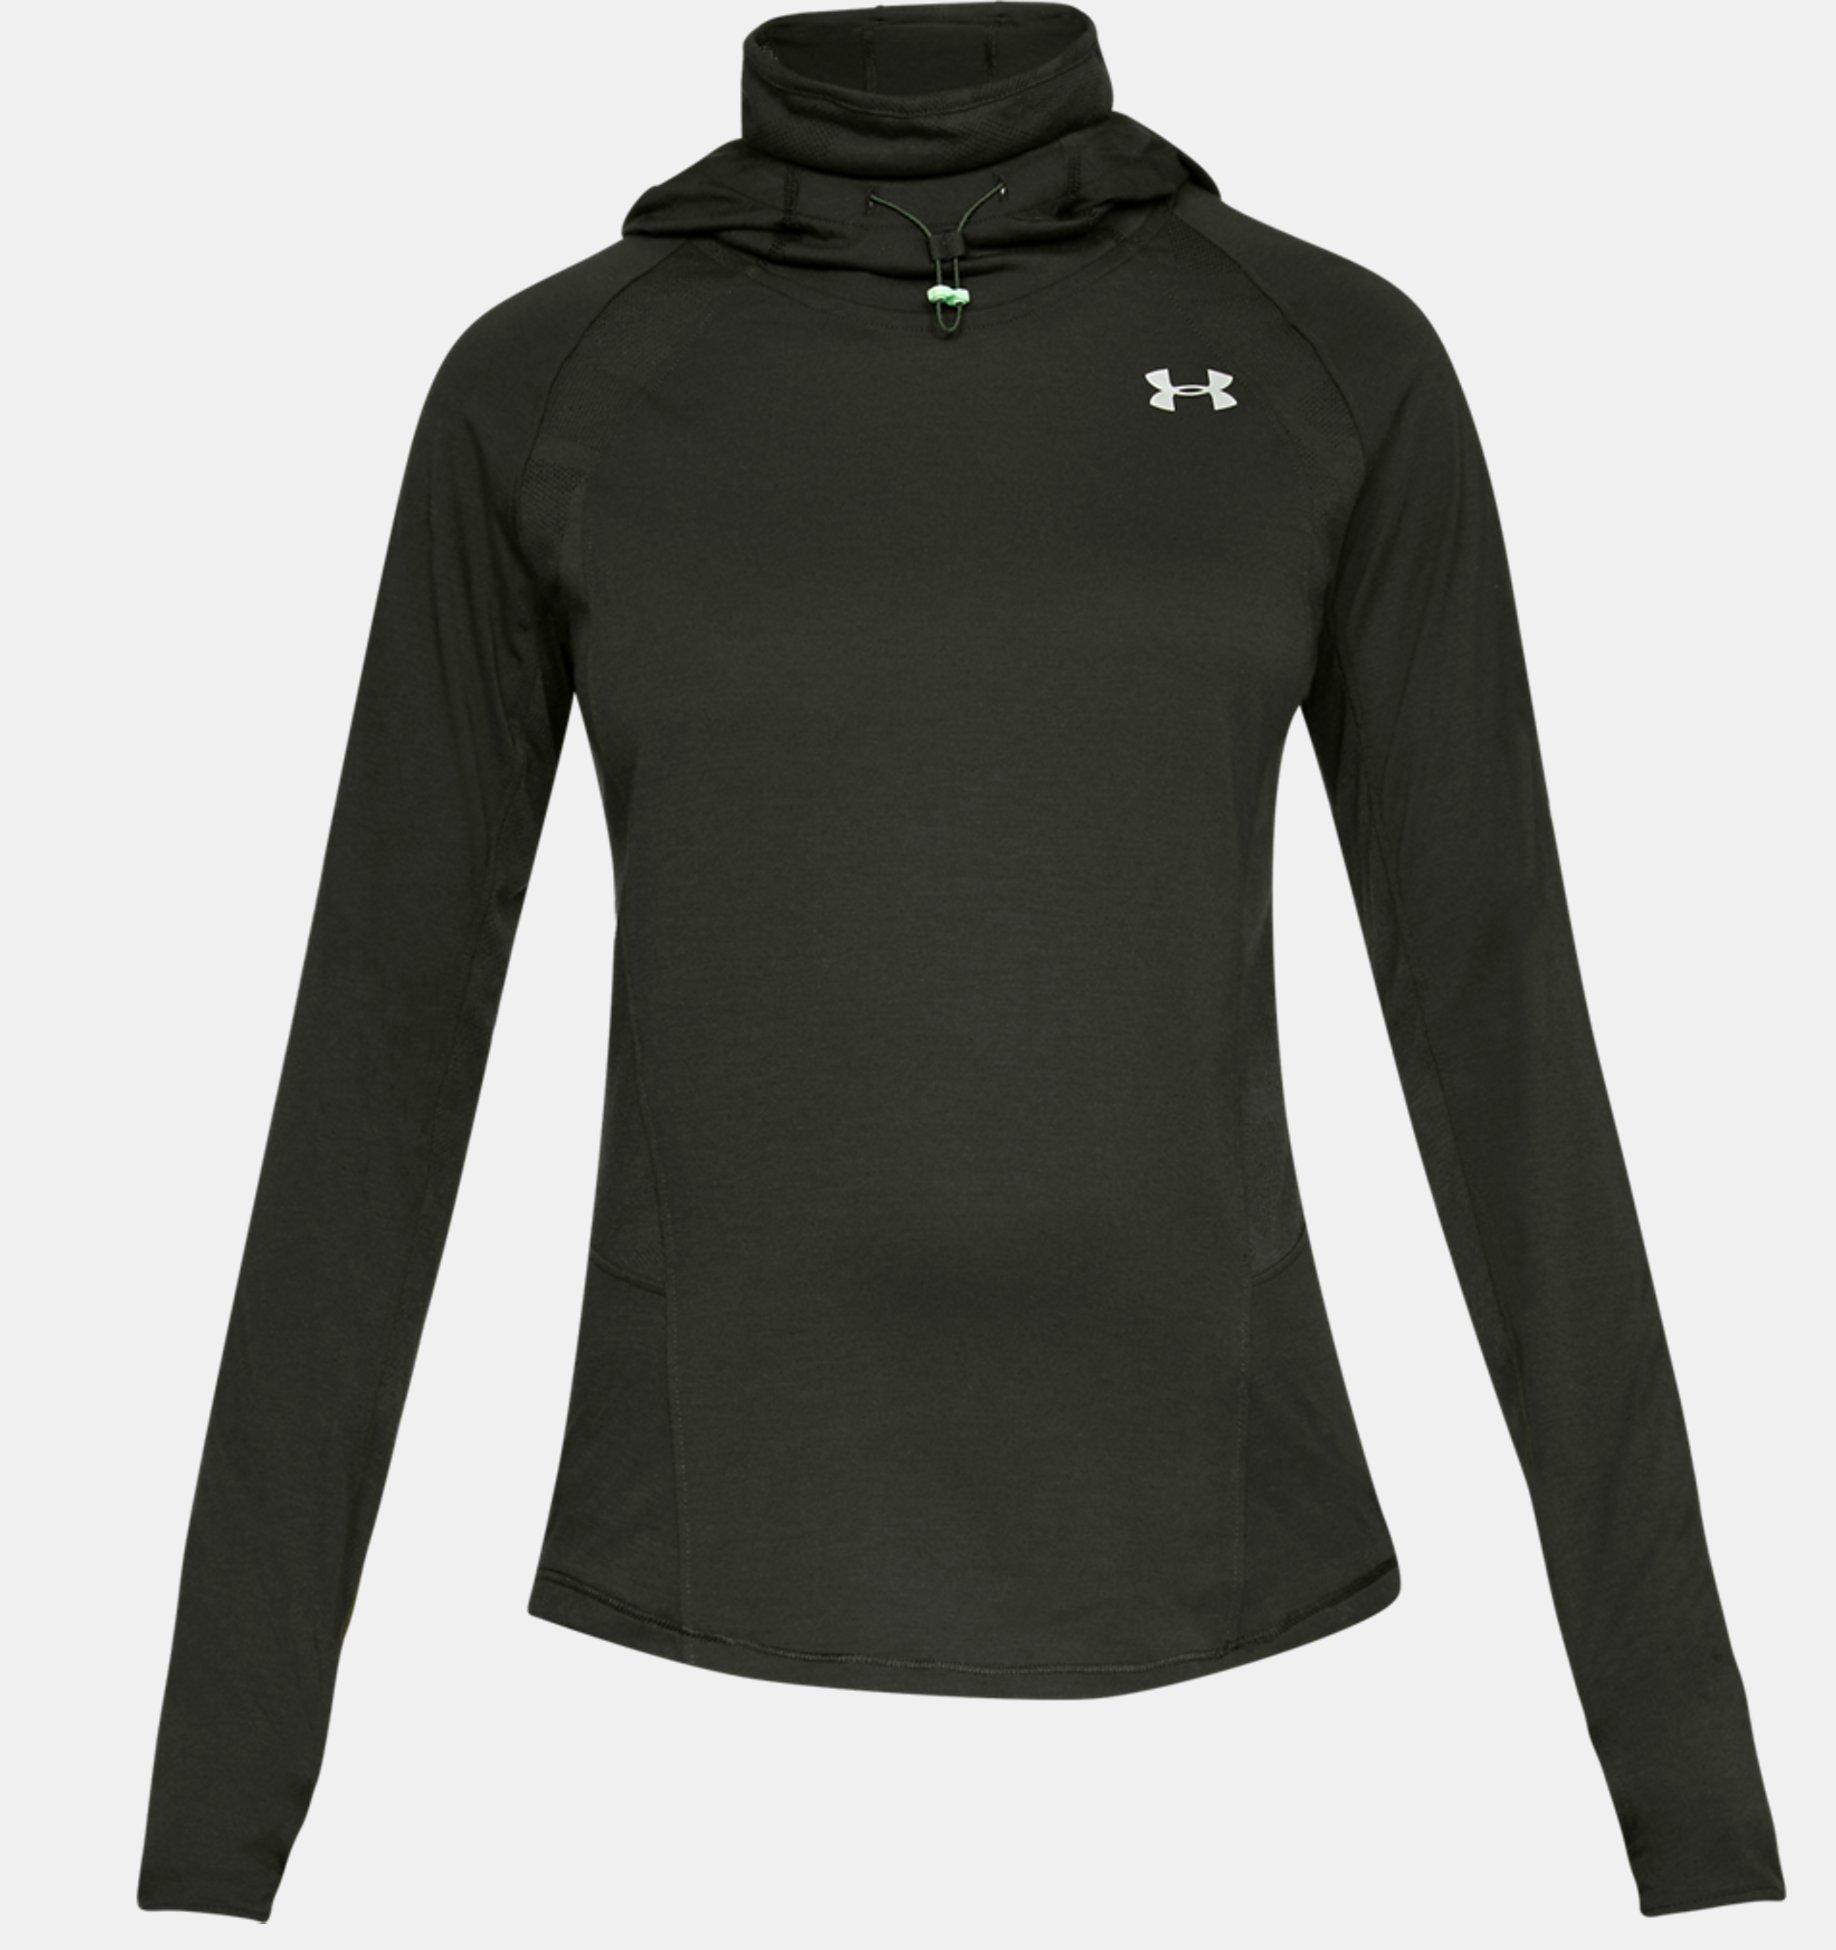 Sweat à capuche à col roulé UA Microthread Swyft pour femme   Under ... ca184e2be537